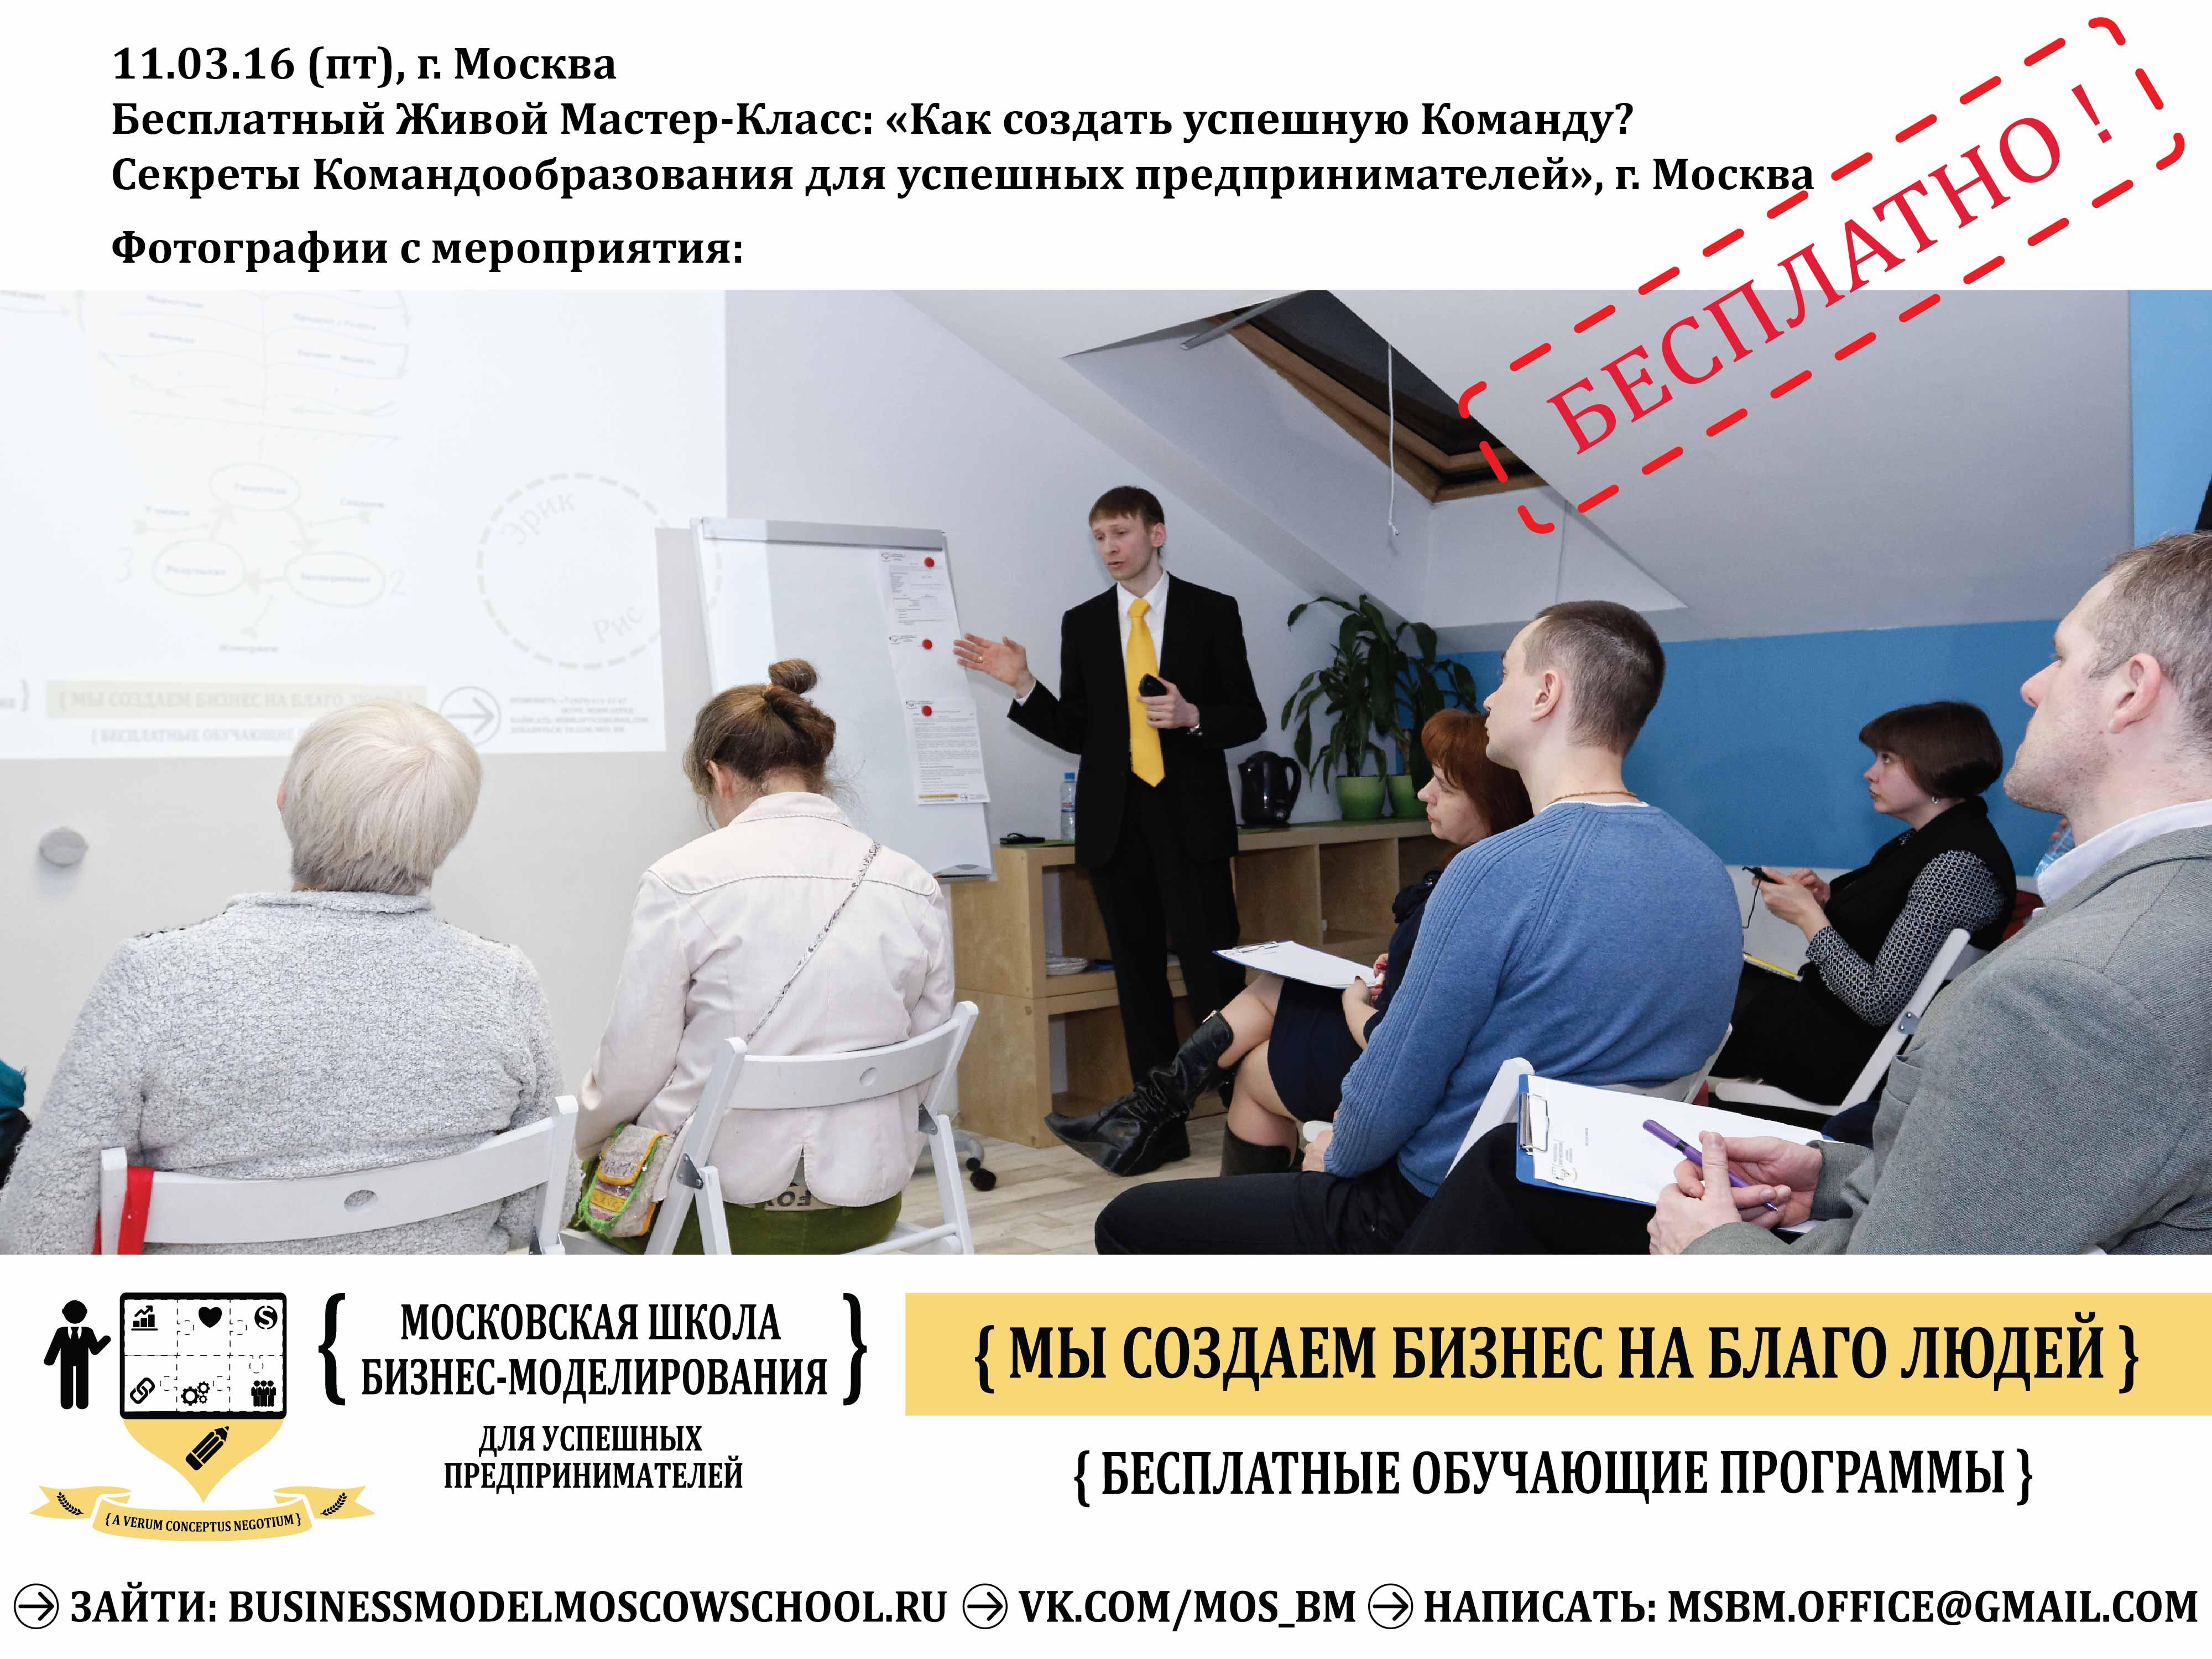 business_model_moscow_school_mclass_photo-11.03.16-1